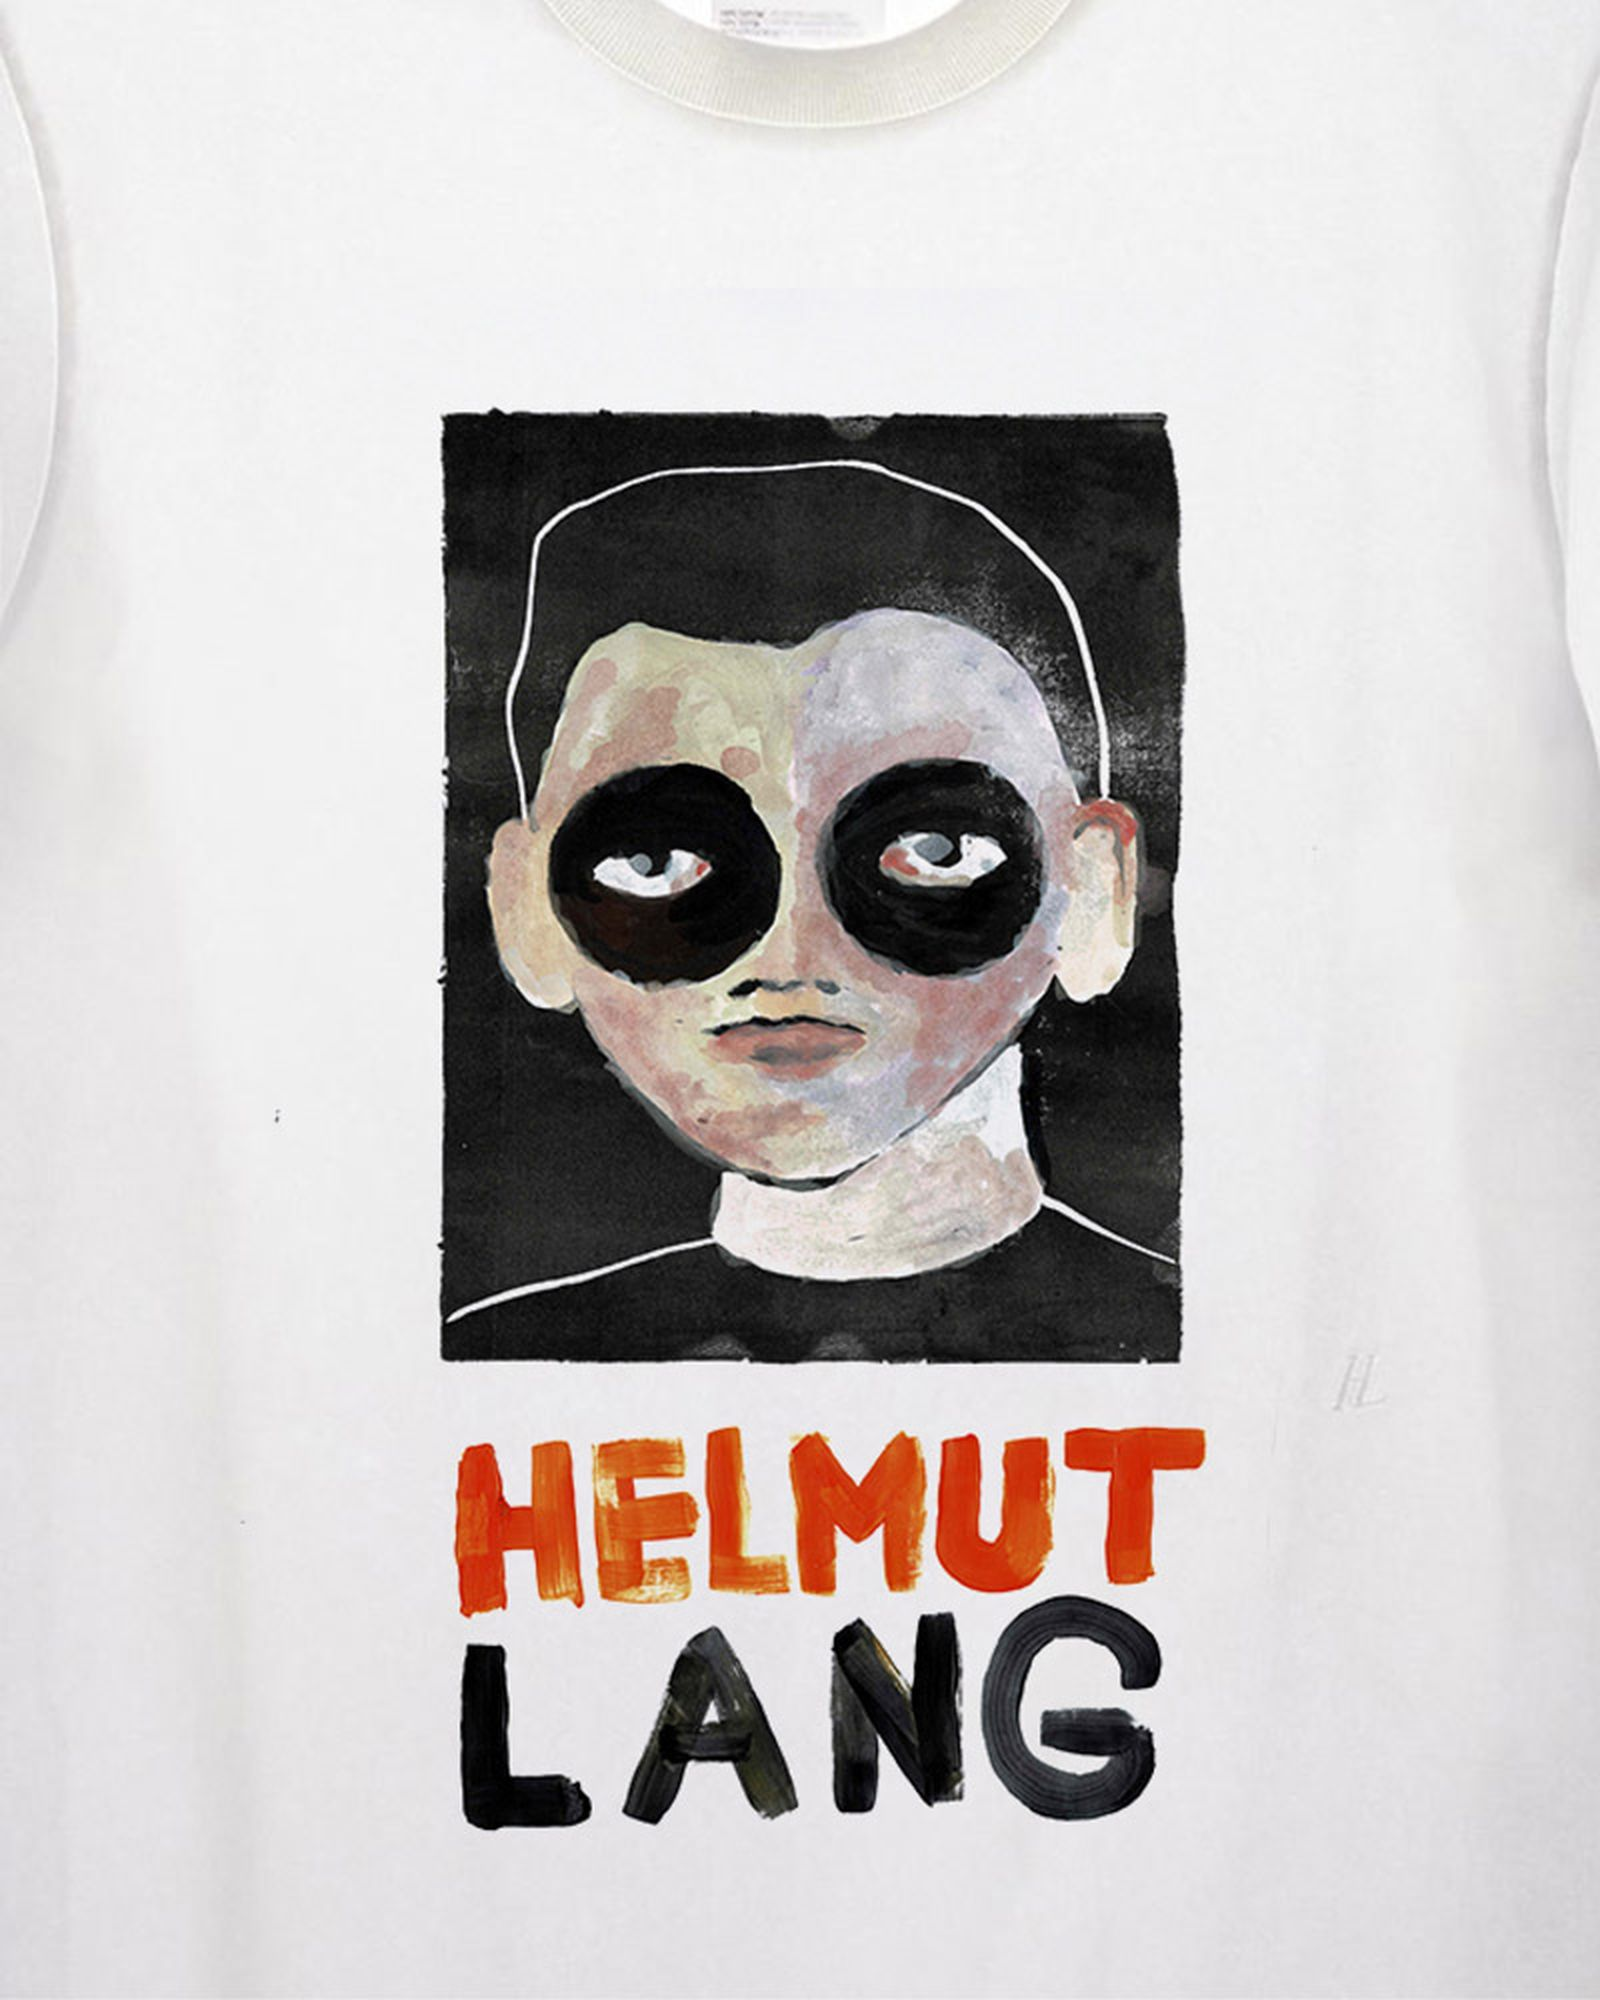 28helmut-lang-t-shirt-design-competition